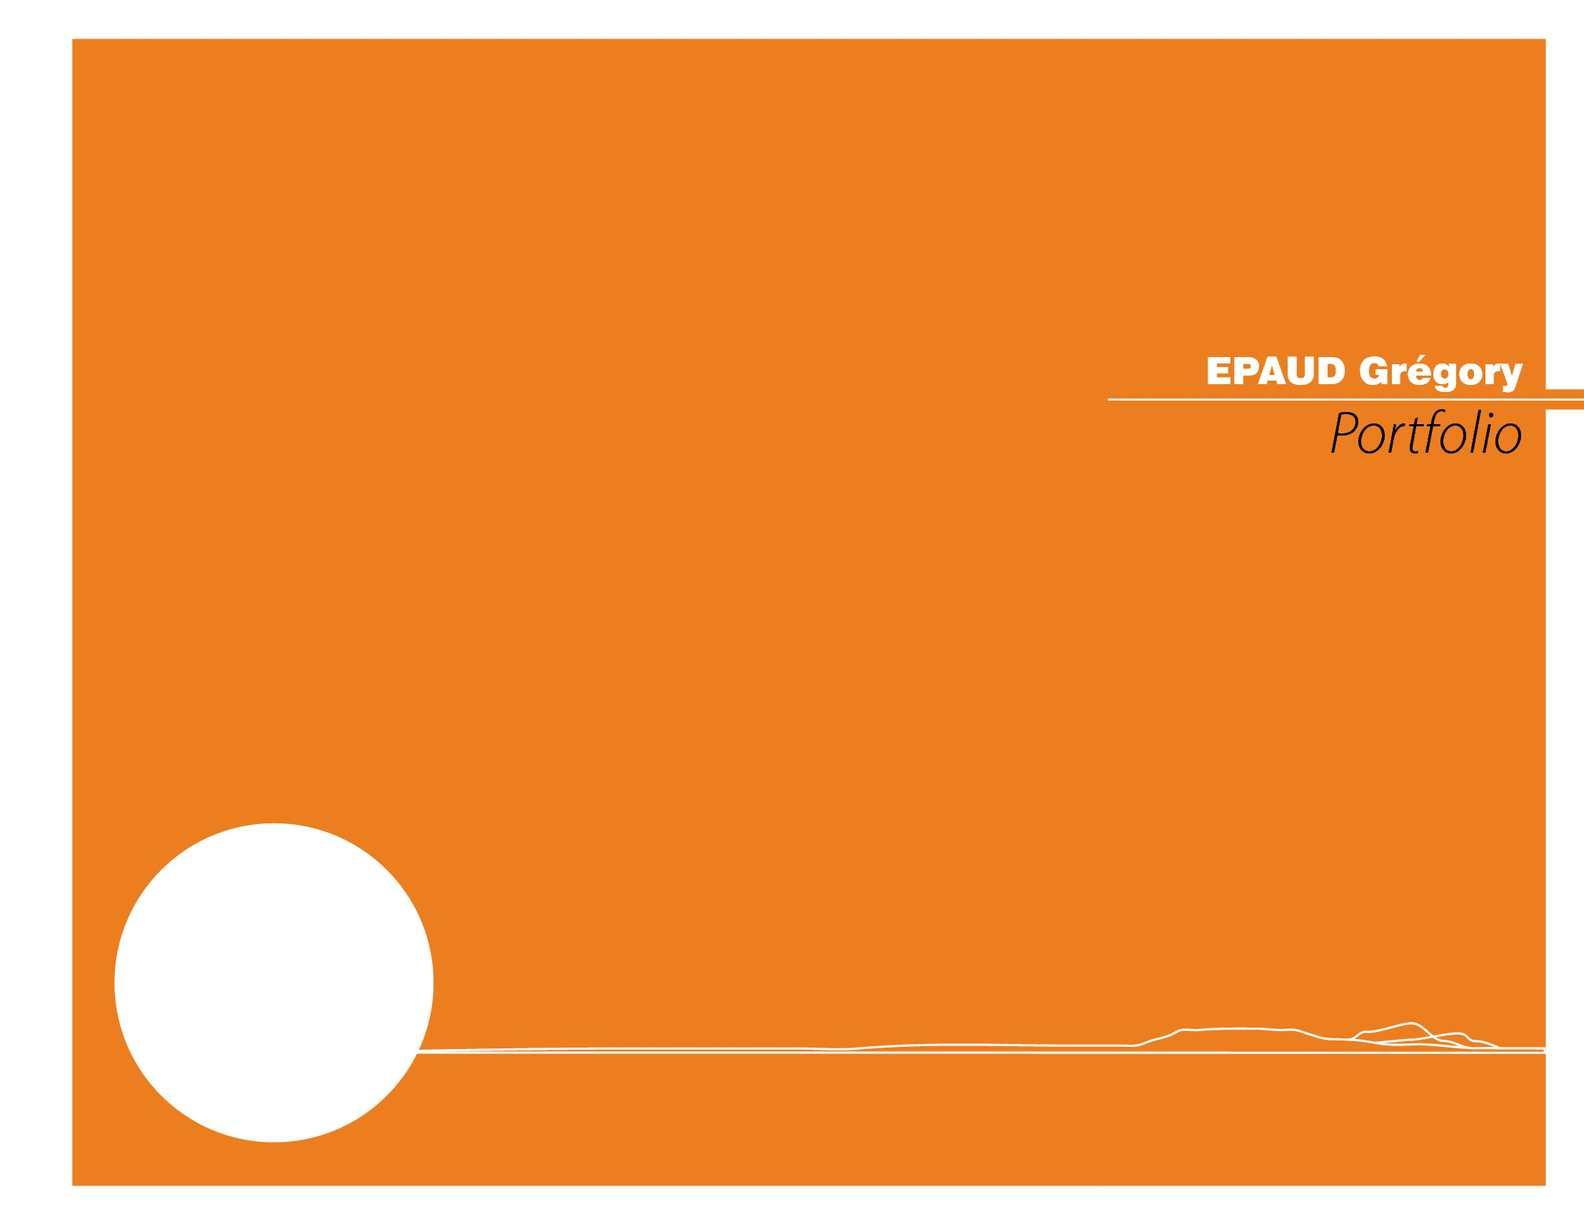 Calam o portfolio 2011 architecte paysagiste epaud for Recherche architecte paysagiste